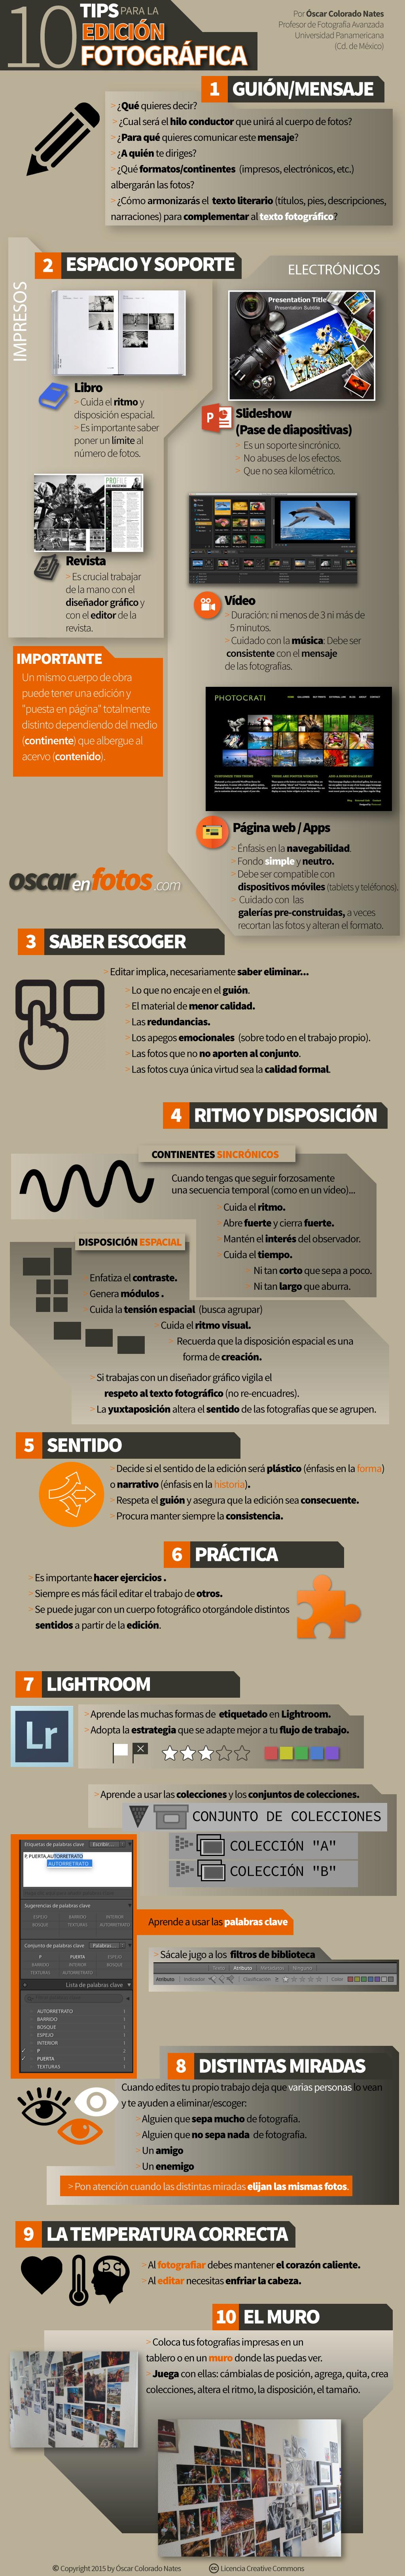 edicion_fotografica_infografico